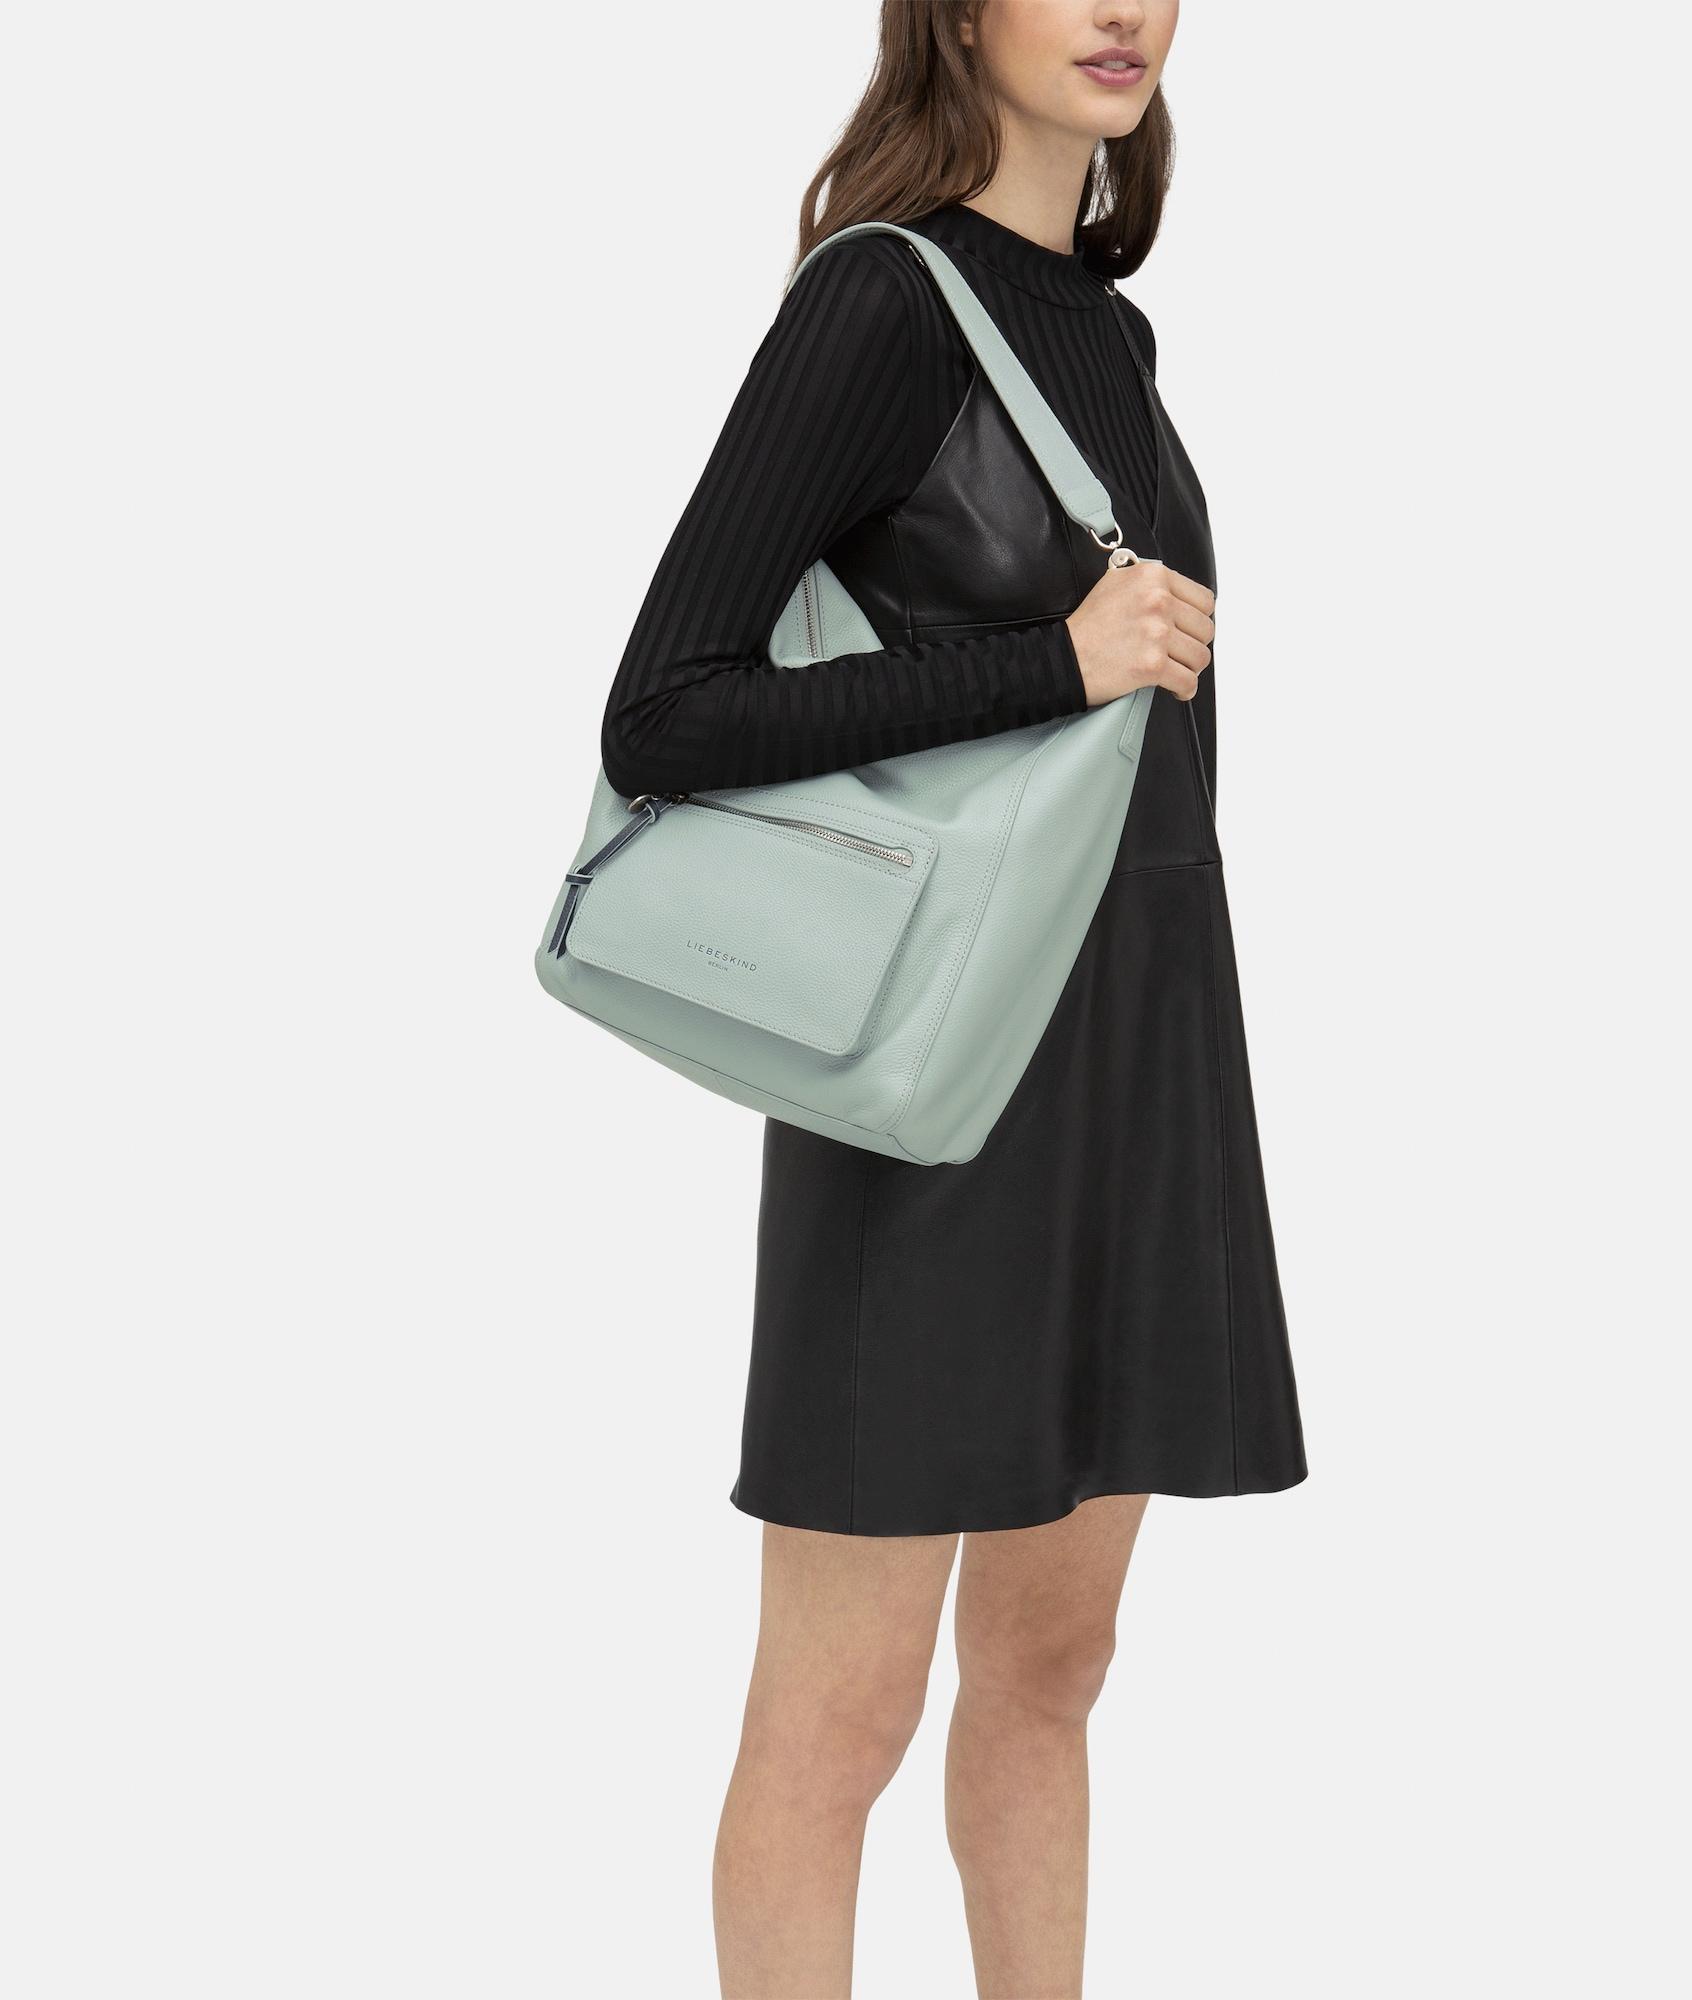 liebeskind berlin - Hobo Bag